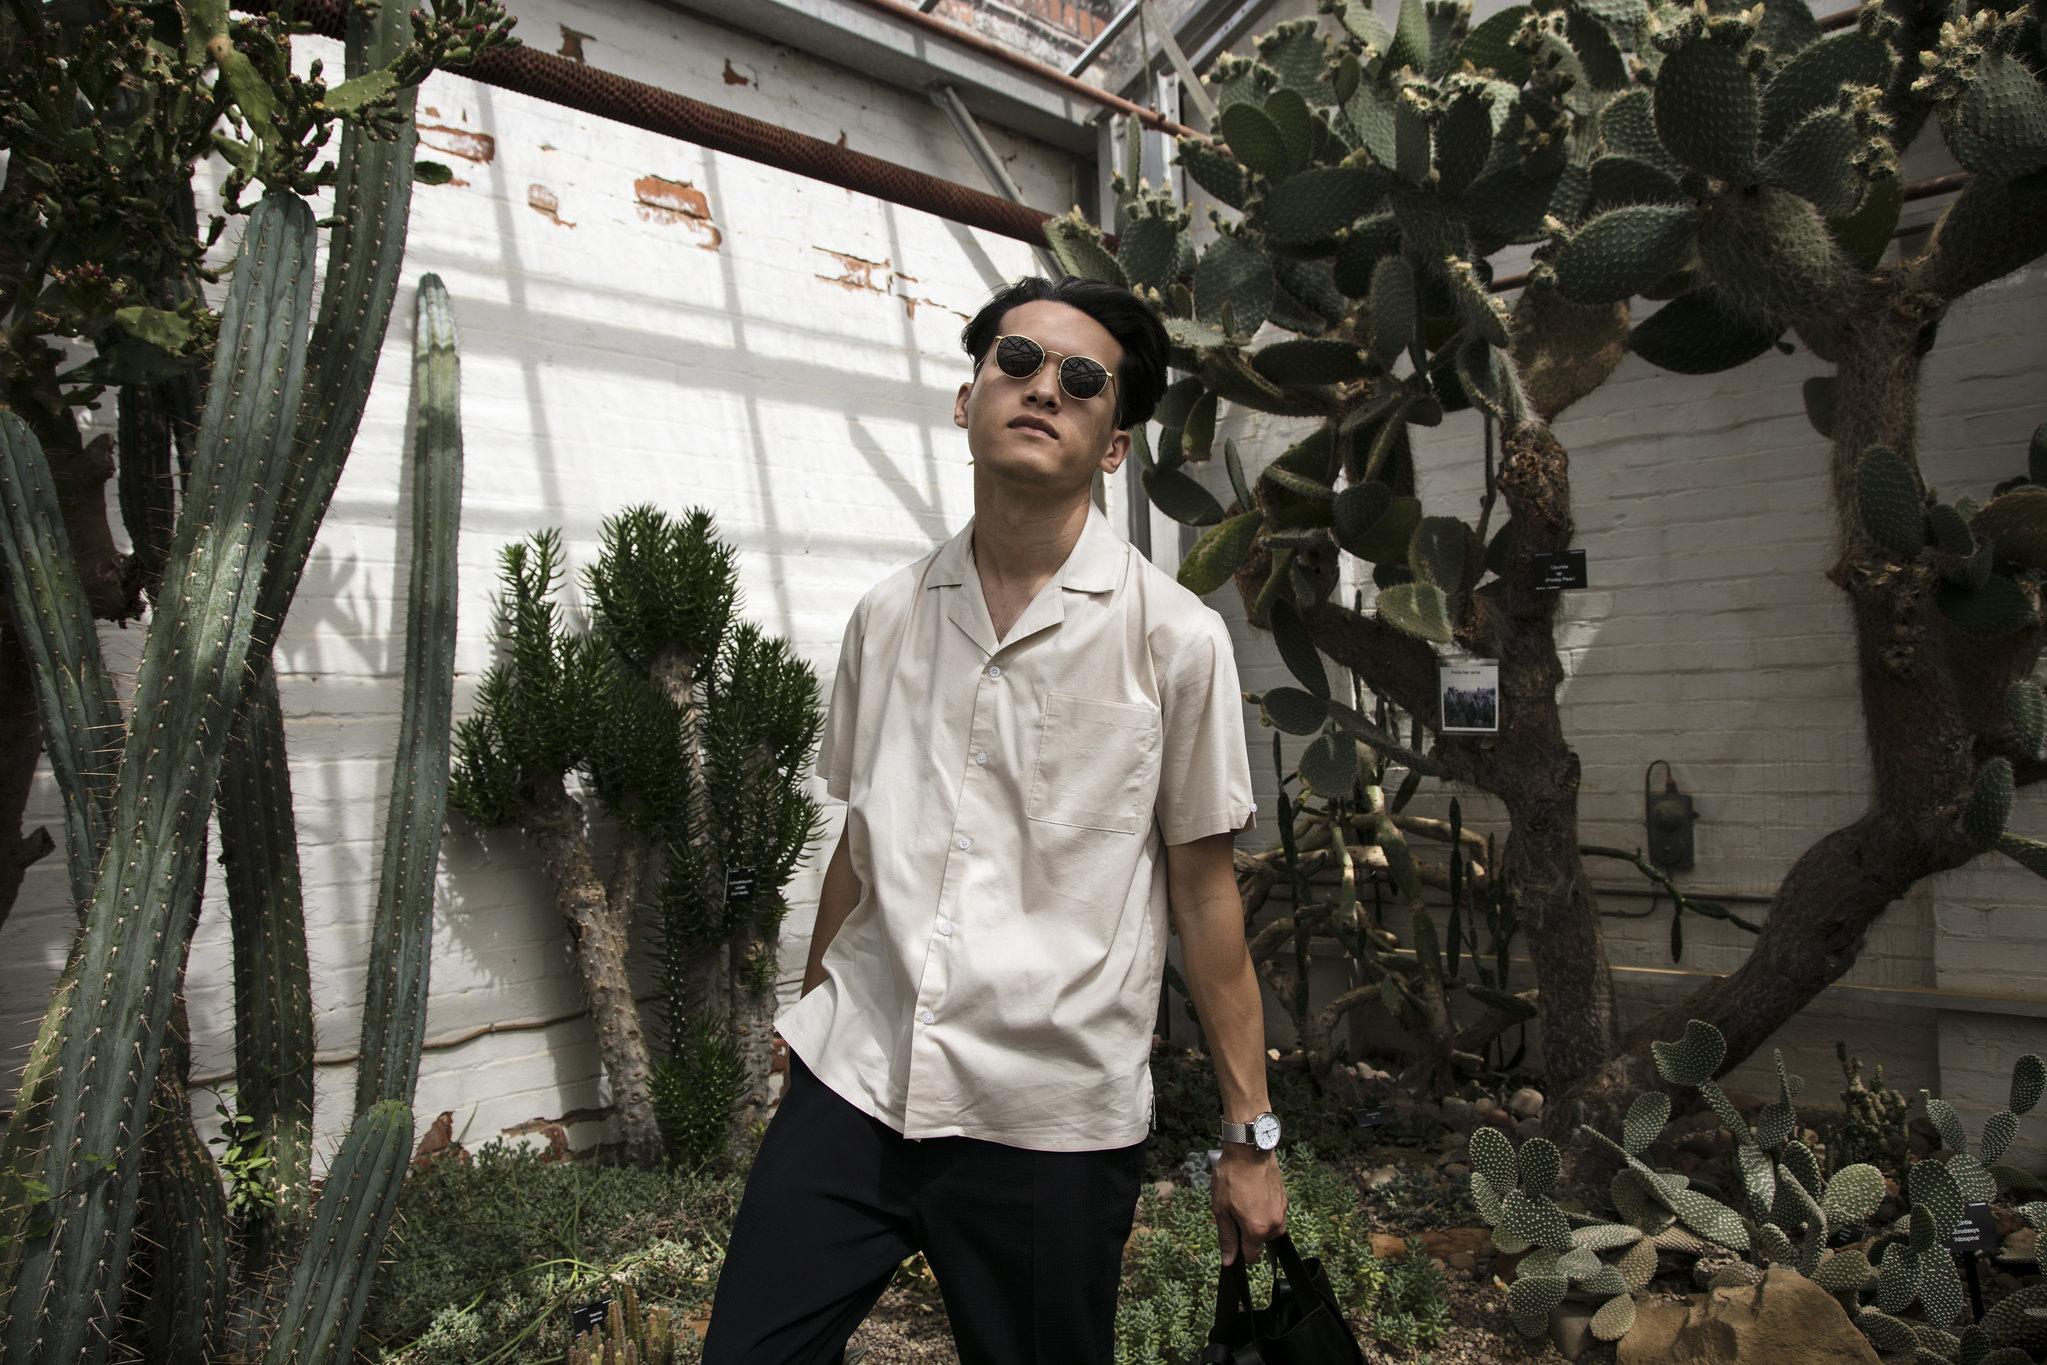 Jordan_Bunker_botanical_gardens_1